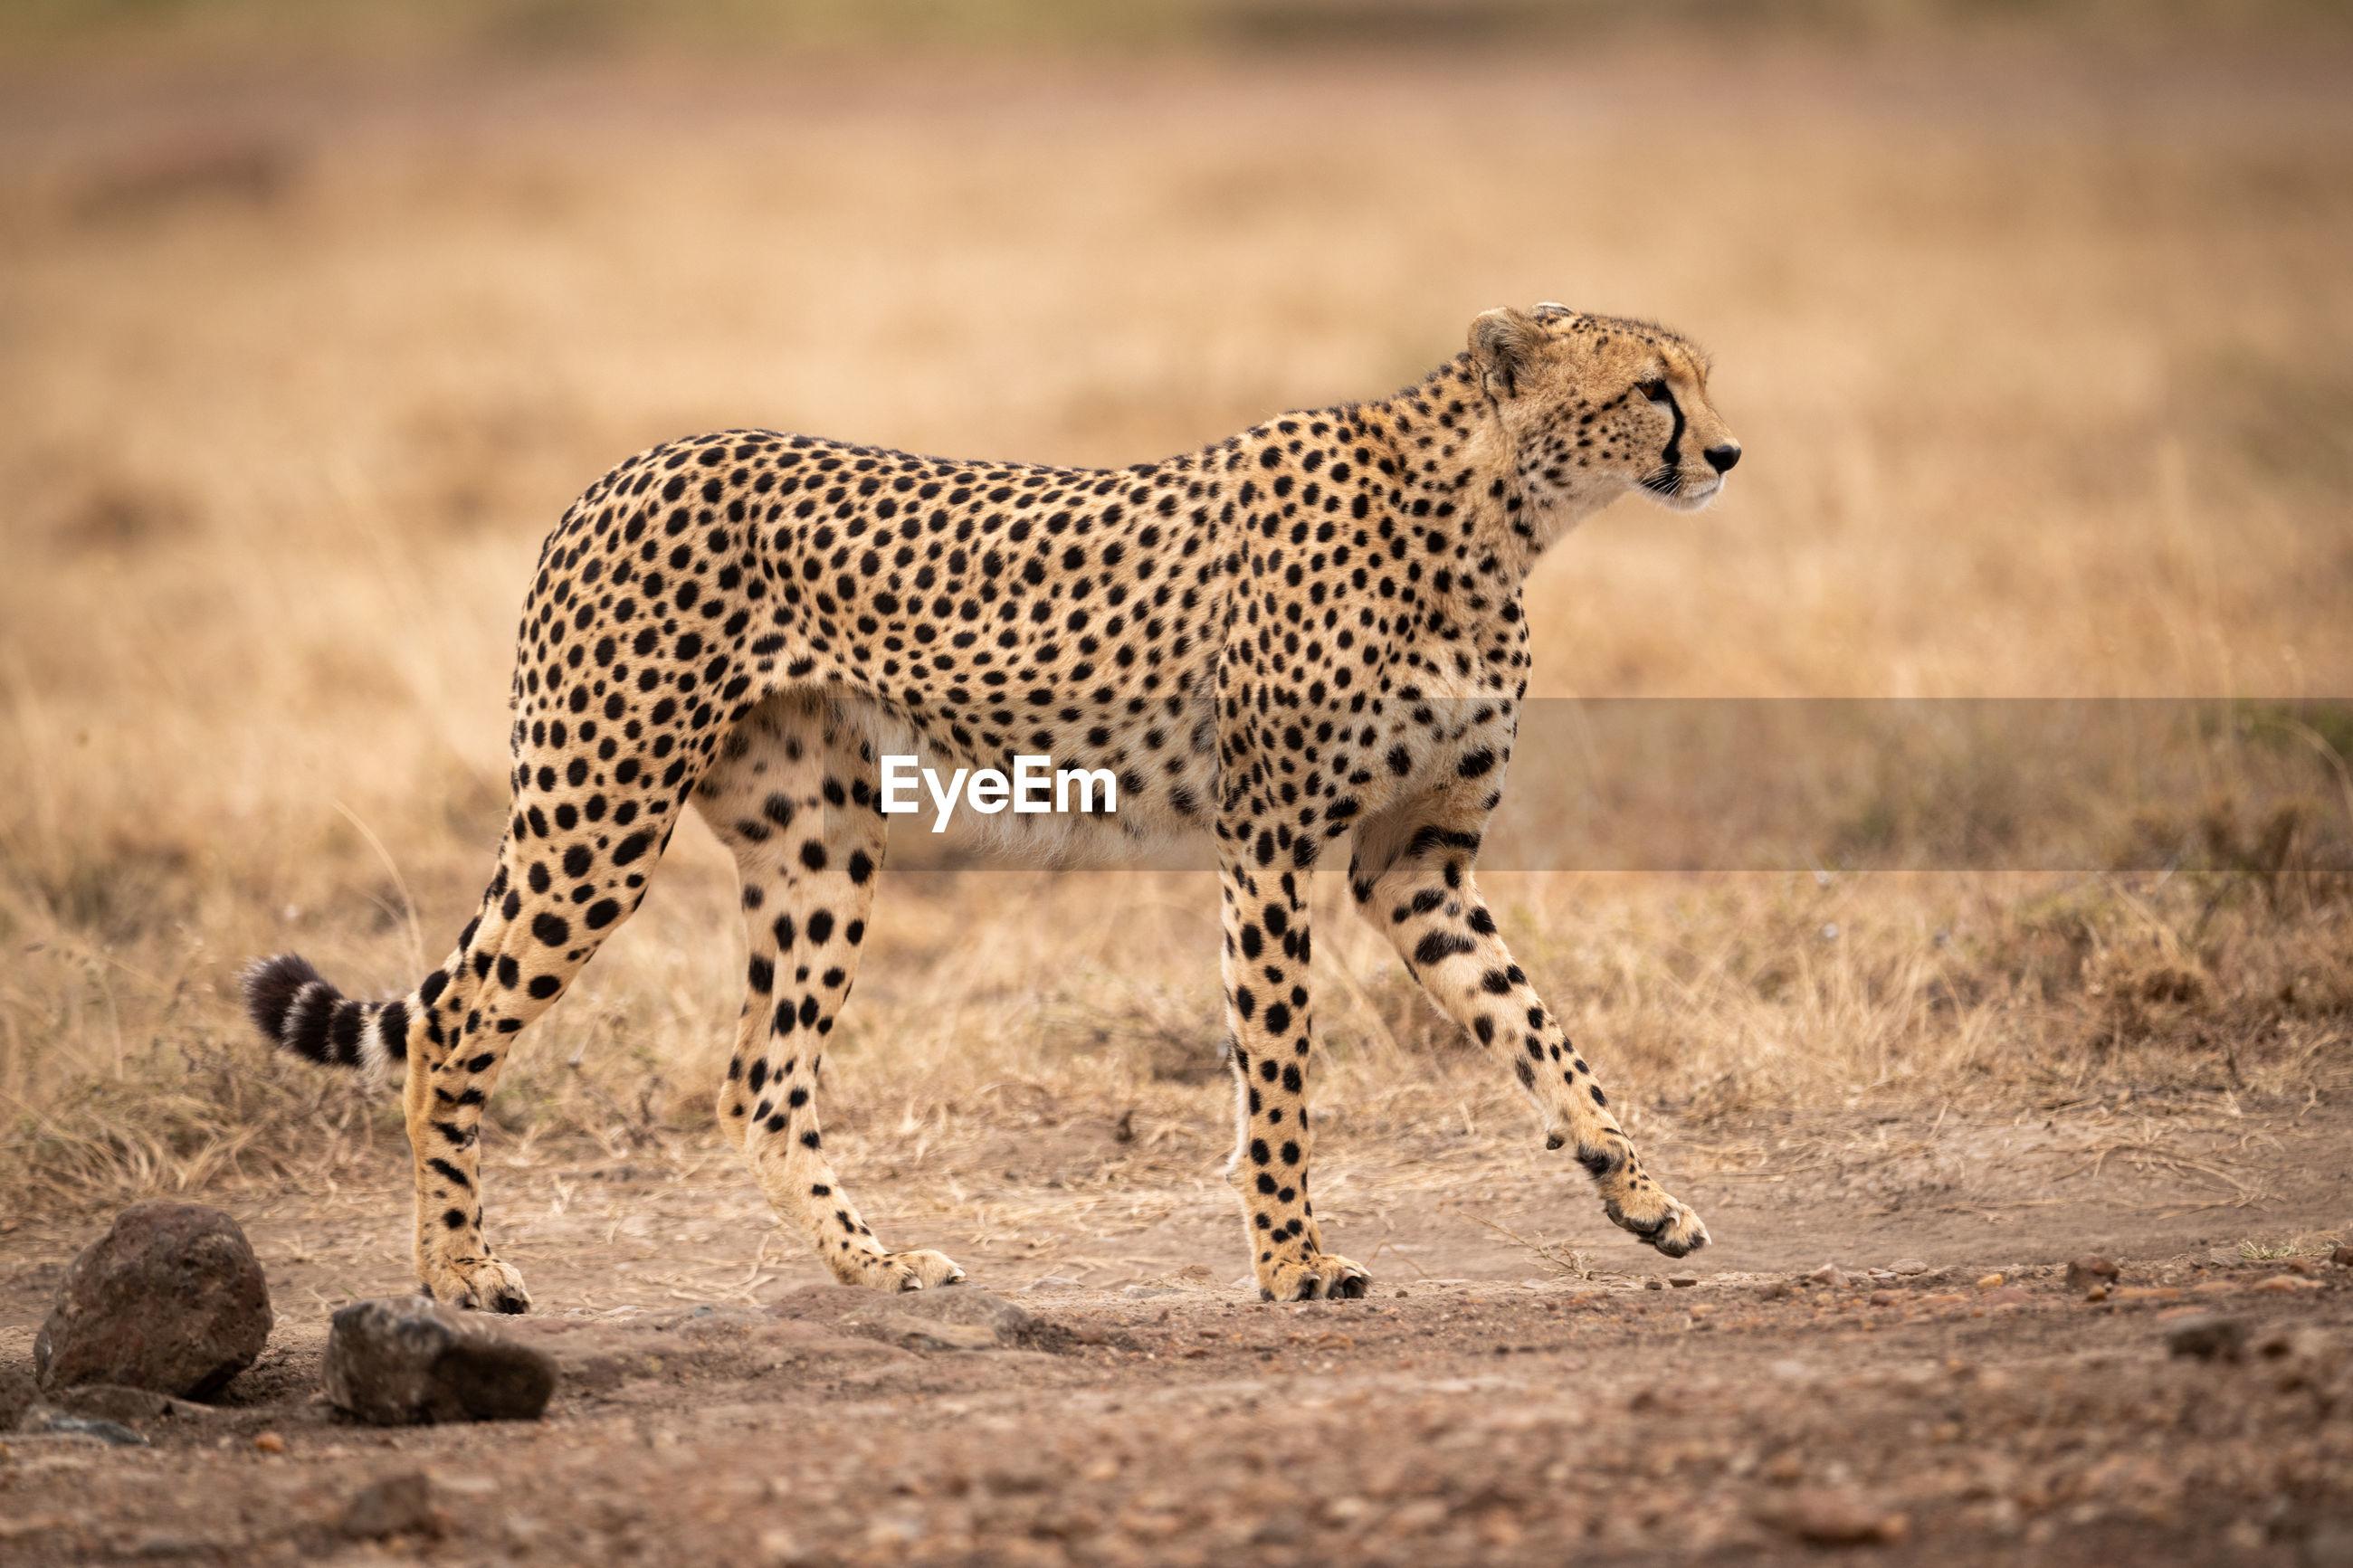 Cheetah walking on field